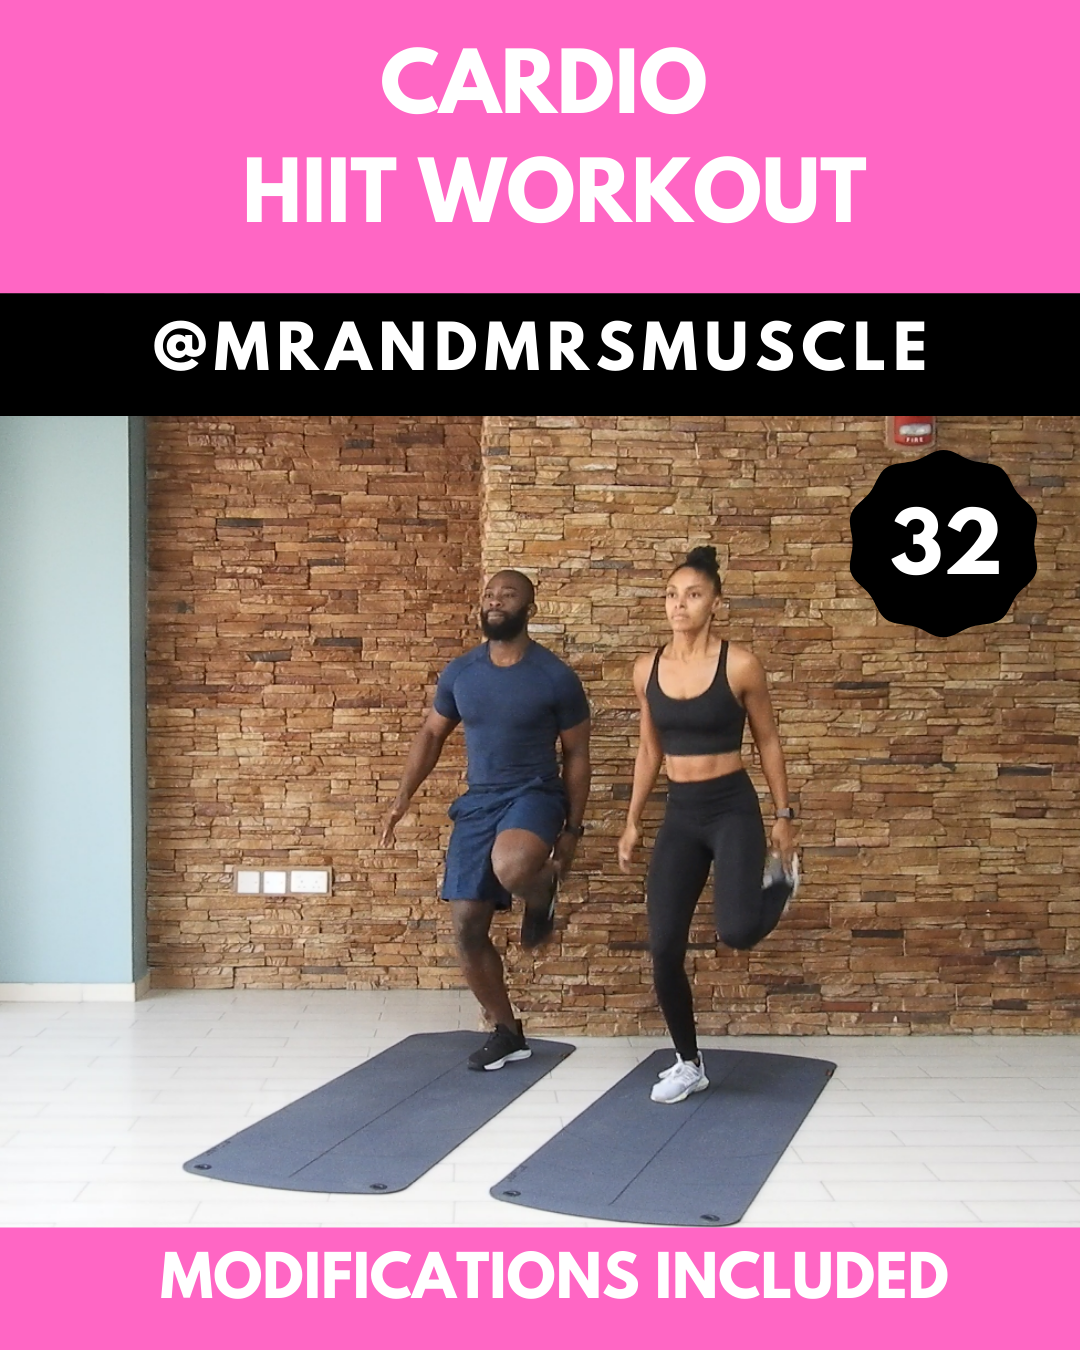 Sweaty Cardio Workout - HOME or GYM